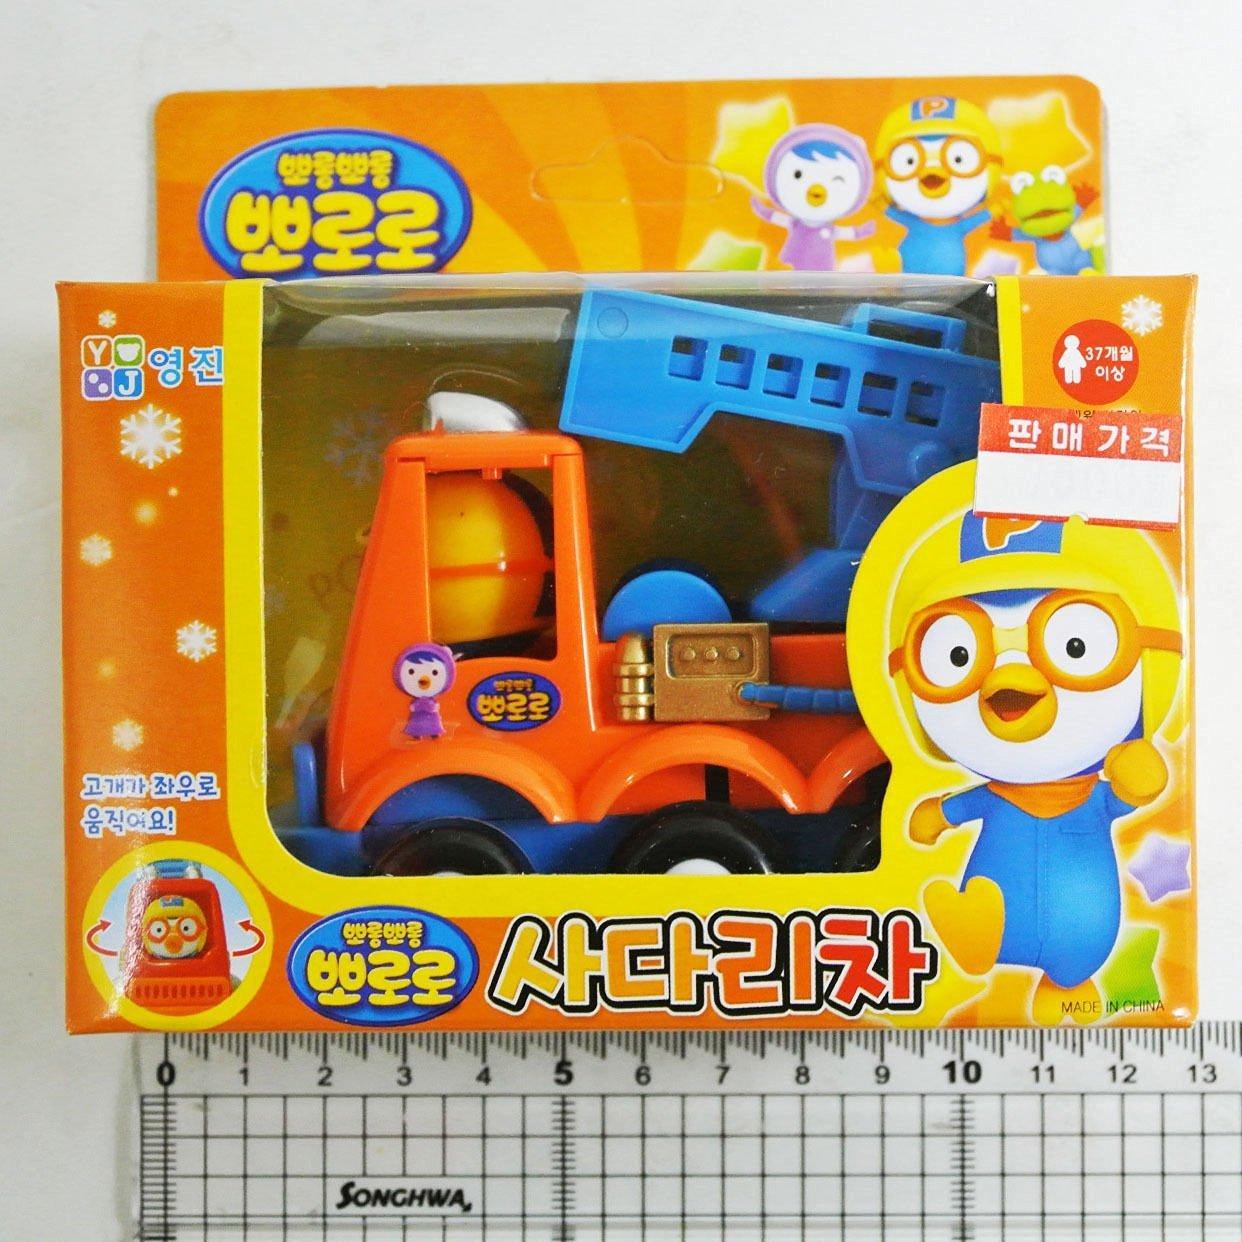 Children Kids Gift Toy Pororo Construction Mini Ladder Car Korean Animation /item# G4W8B-48Q36062